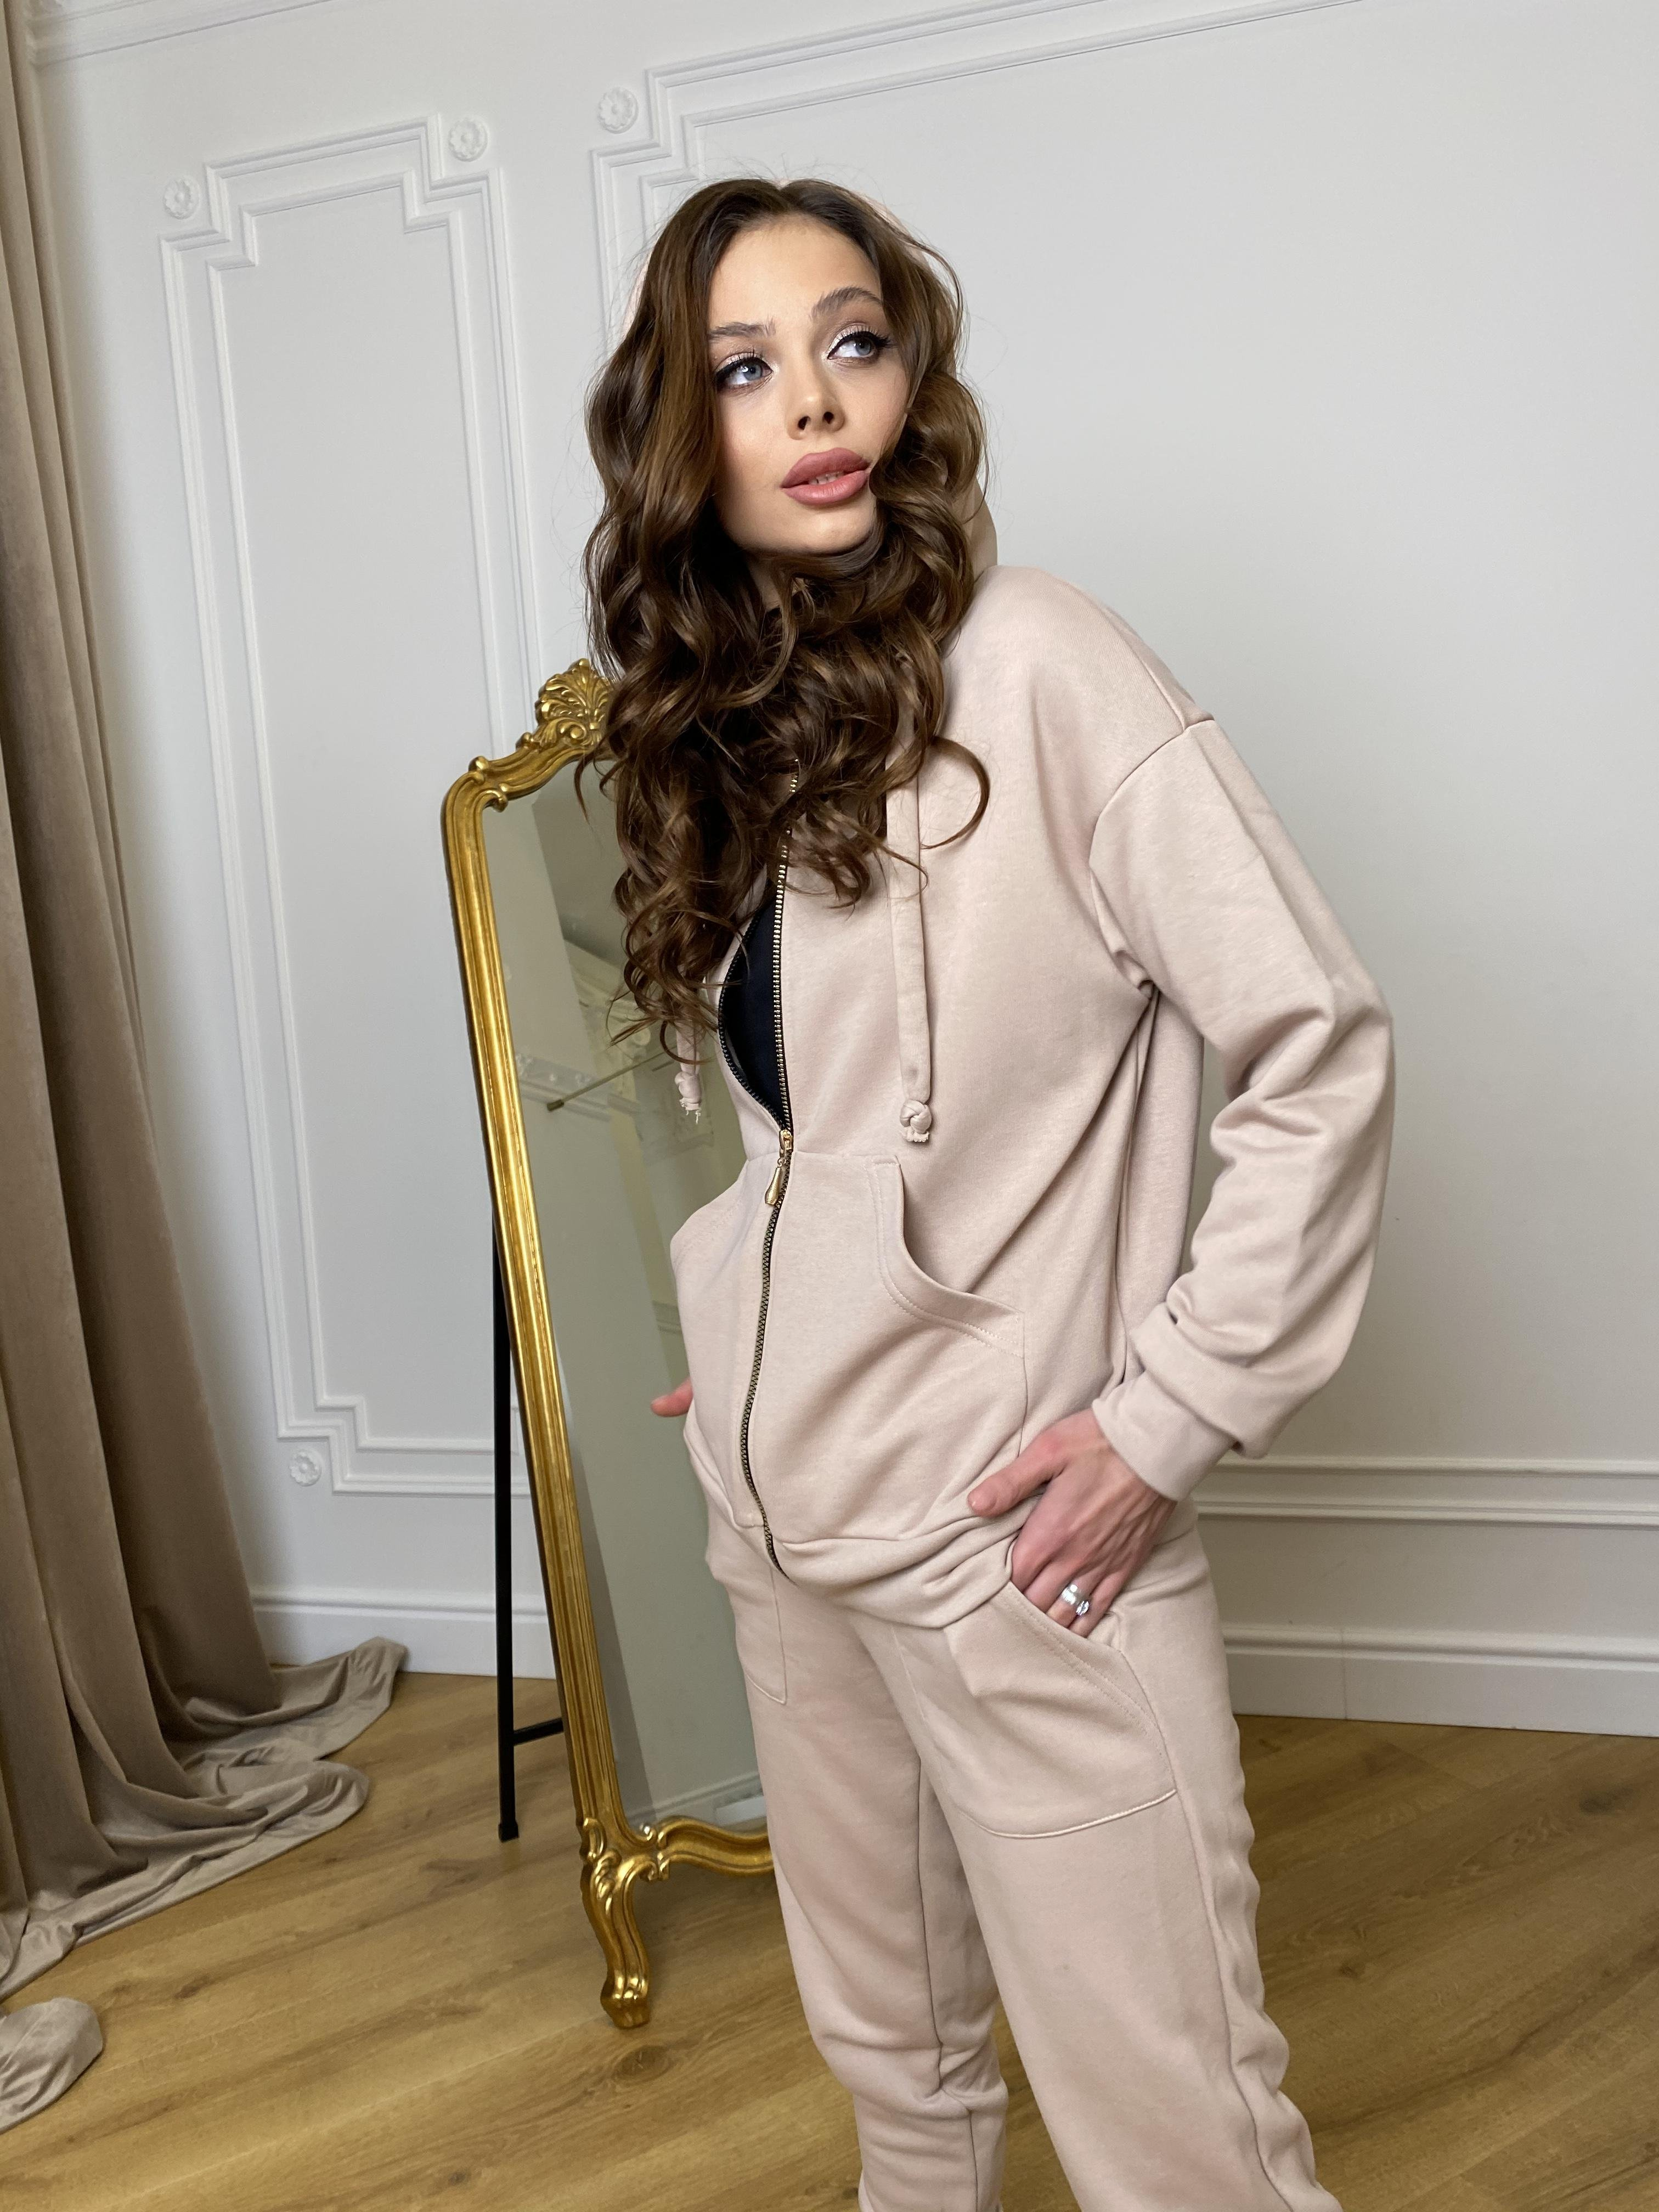 Брокер костюм  из 3х нитки  9634 АРТ. 45981 Цвет: Бежевый - фото 7, интернет магазин tm-modus.ru